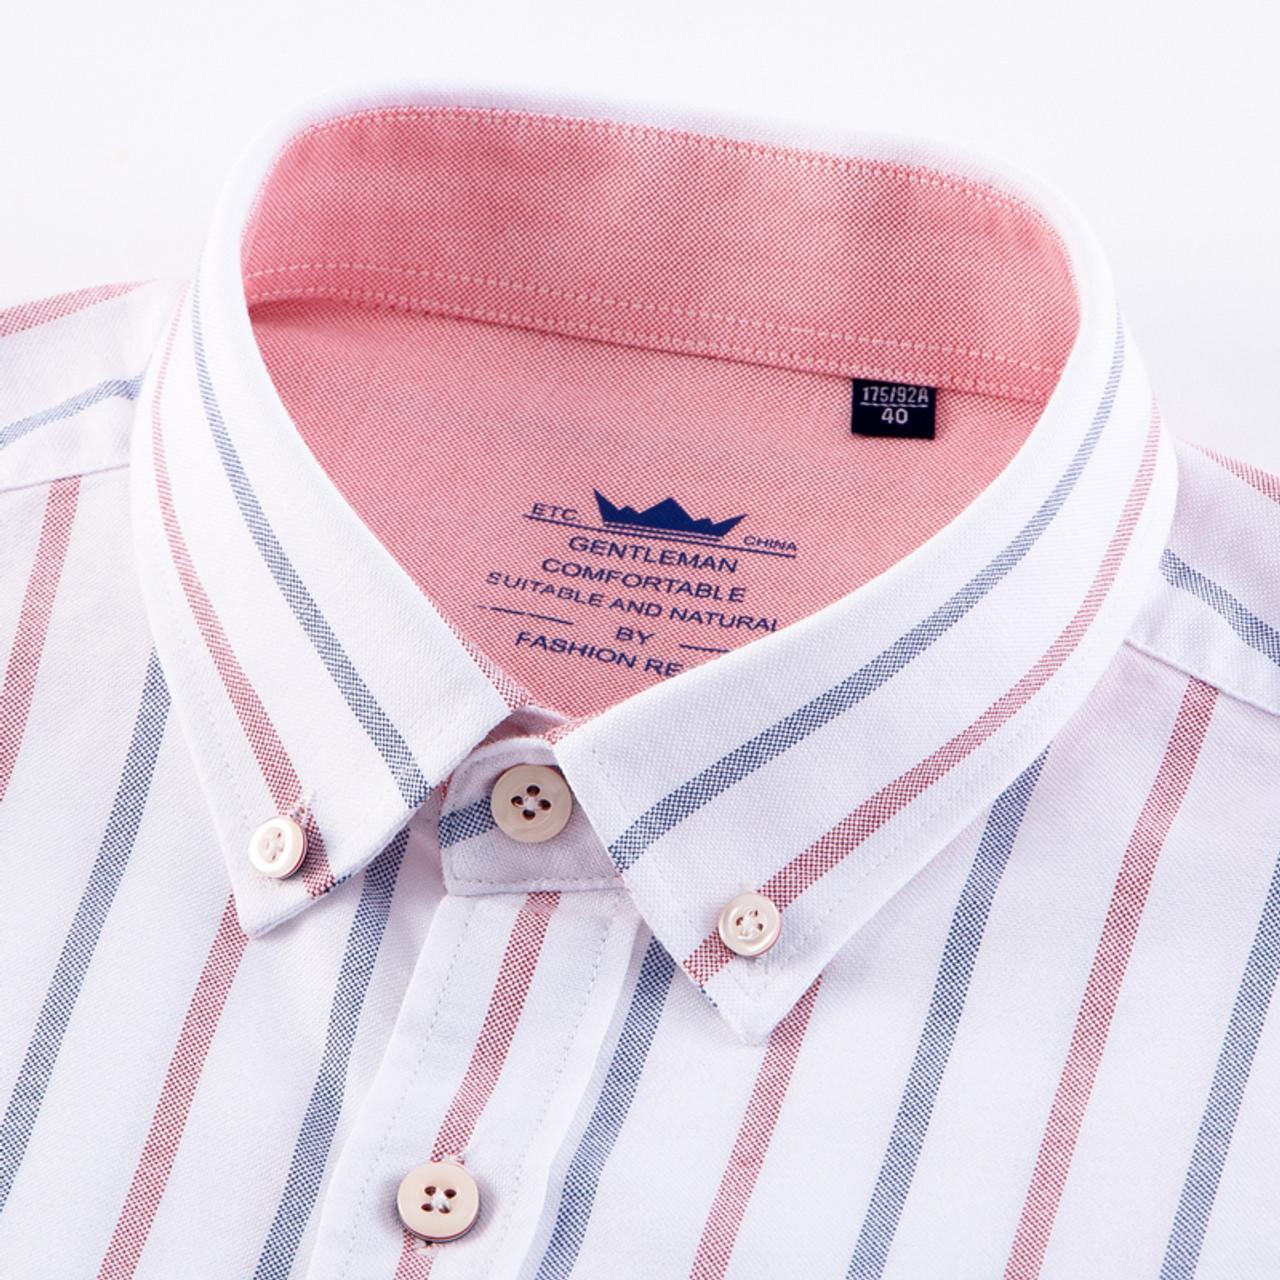 f5c85b180 ... Men's 100% Cotton Multi Striped Oxford Dress Shirt with Left Chest  Pocket Smart Casual Regular ...